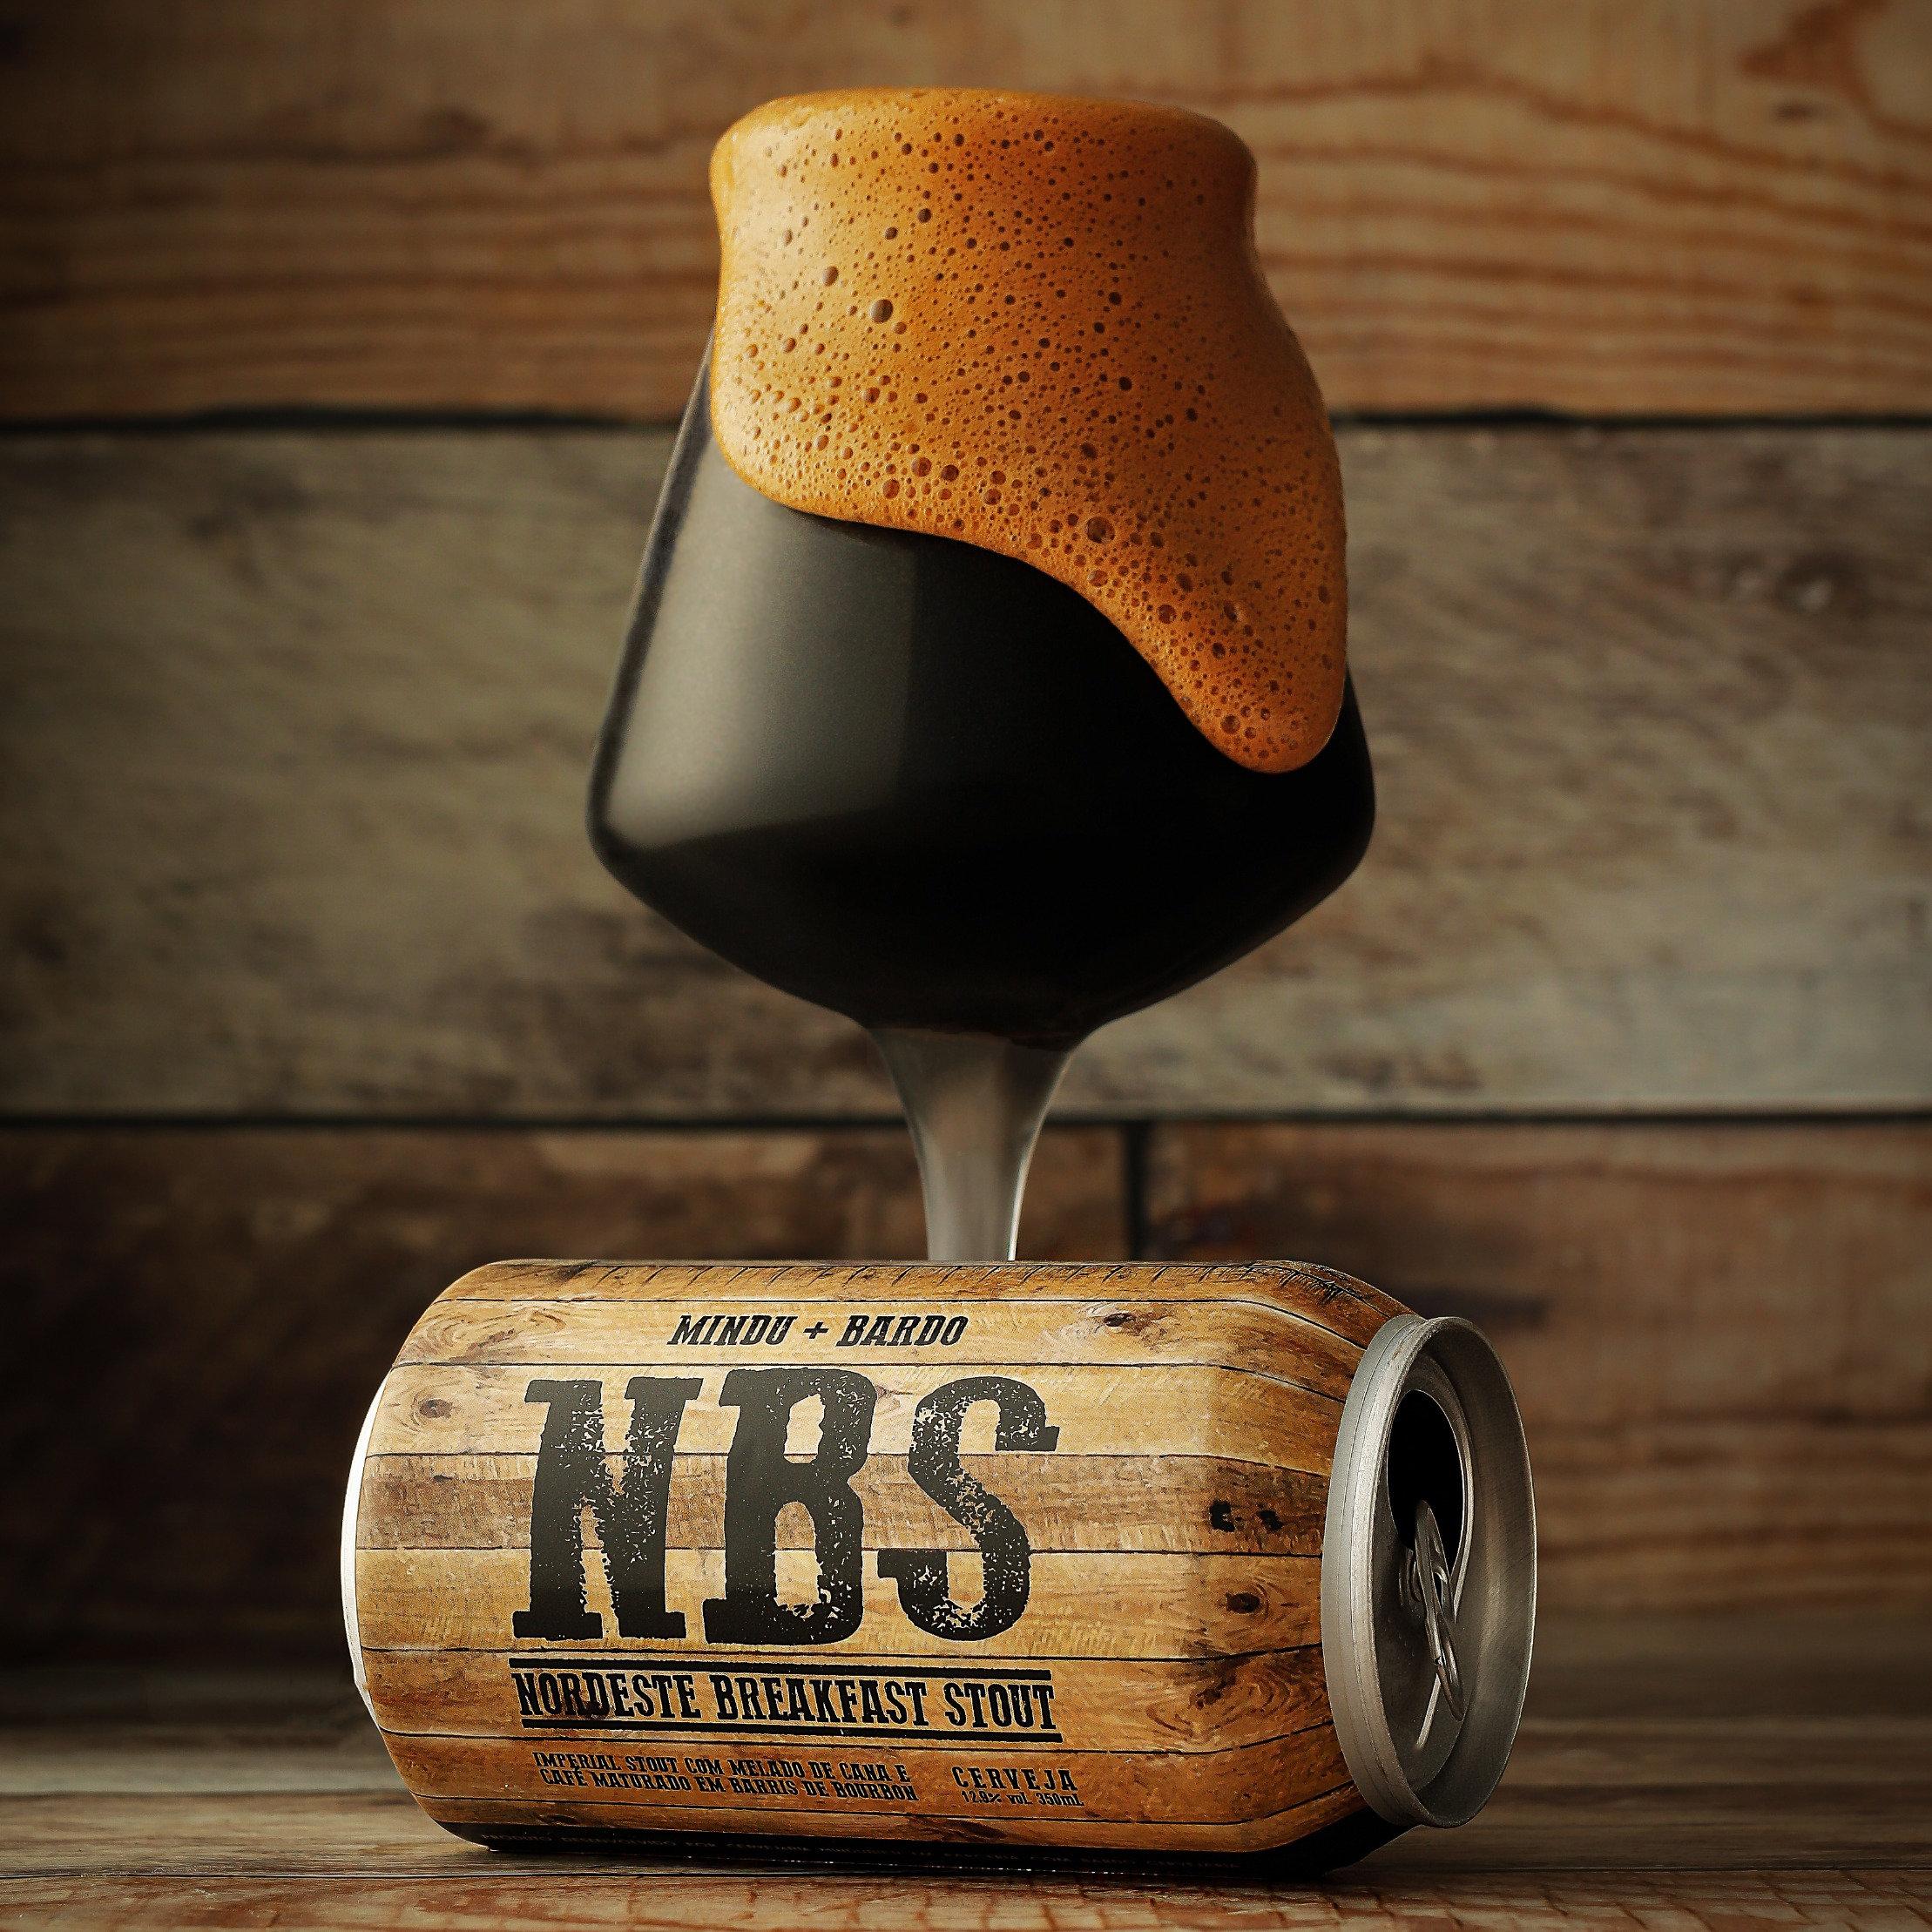 Cerveja artesanal Mindu + Bardo NBS Nordeste Breakfast Stout RIS – Mindubier 350 ml